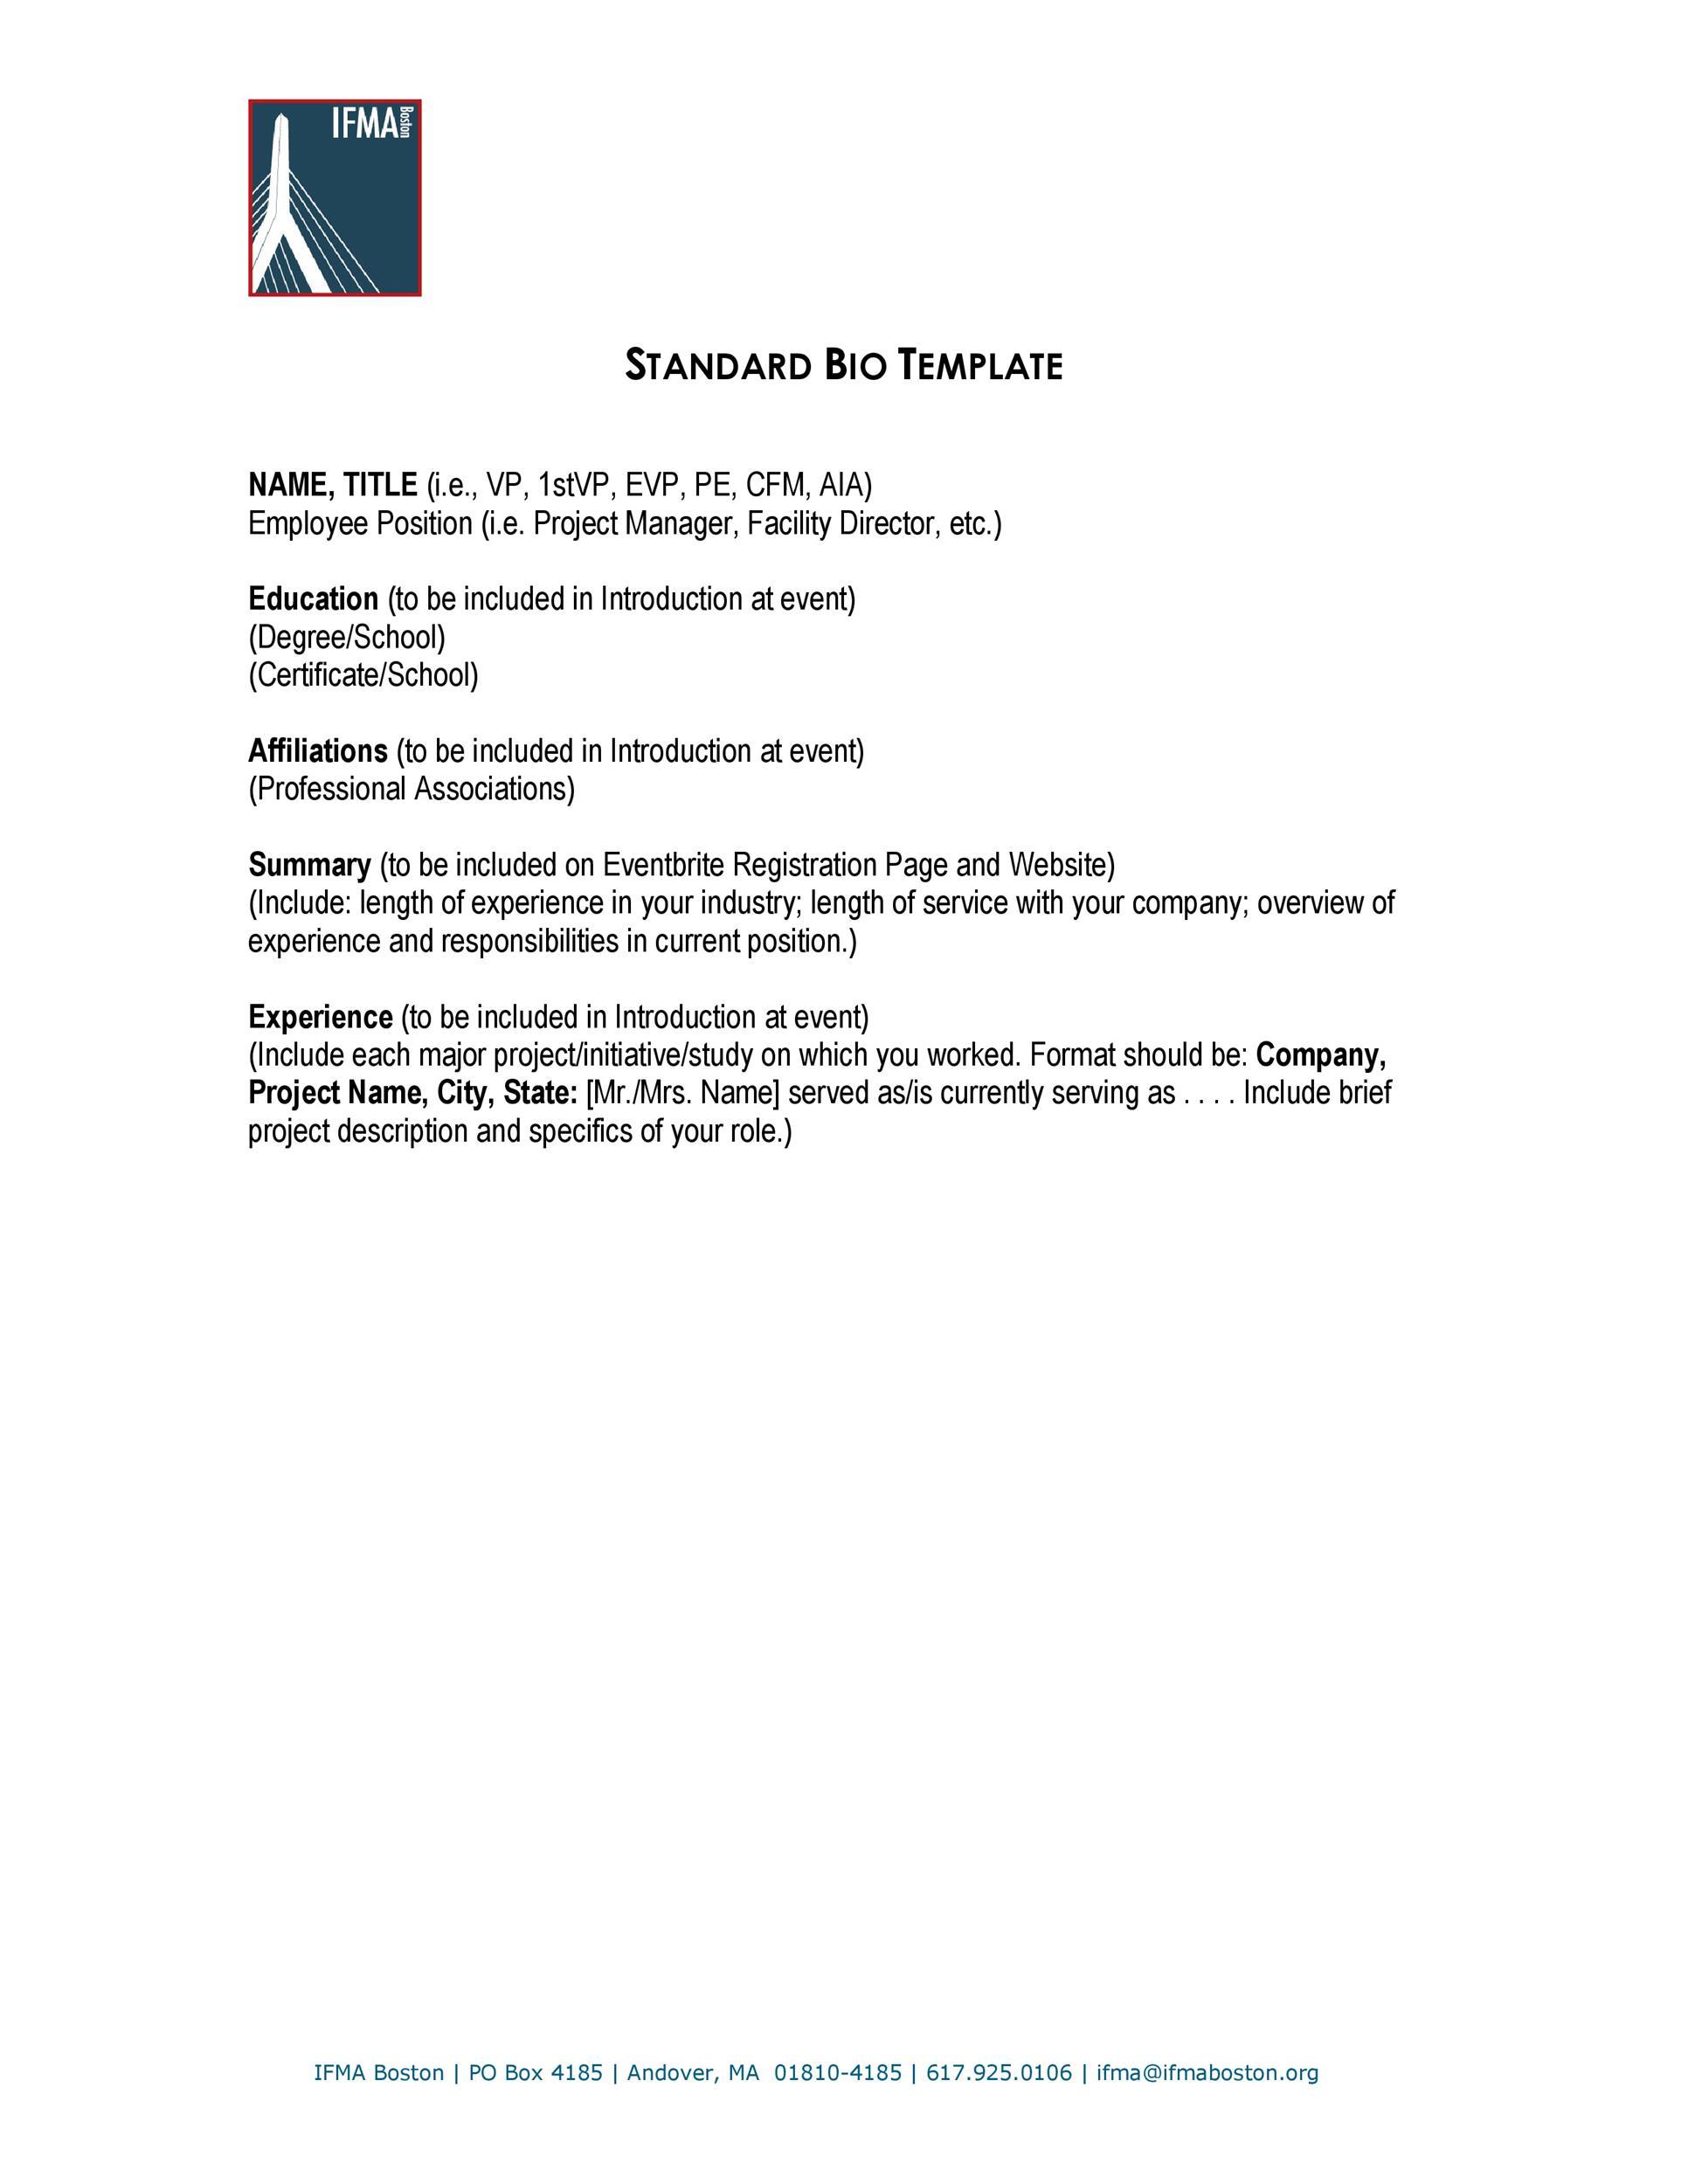 Free STANDARD BIO TEMPLATE